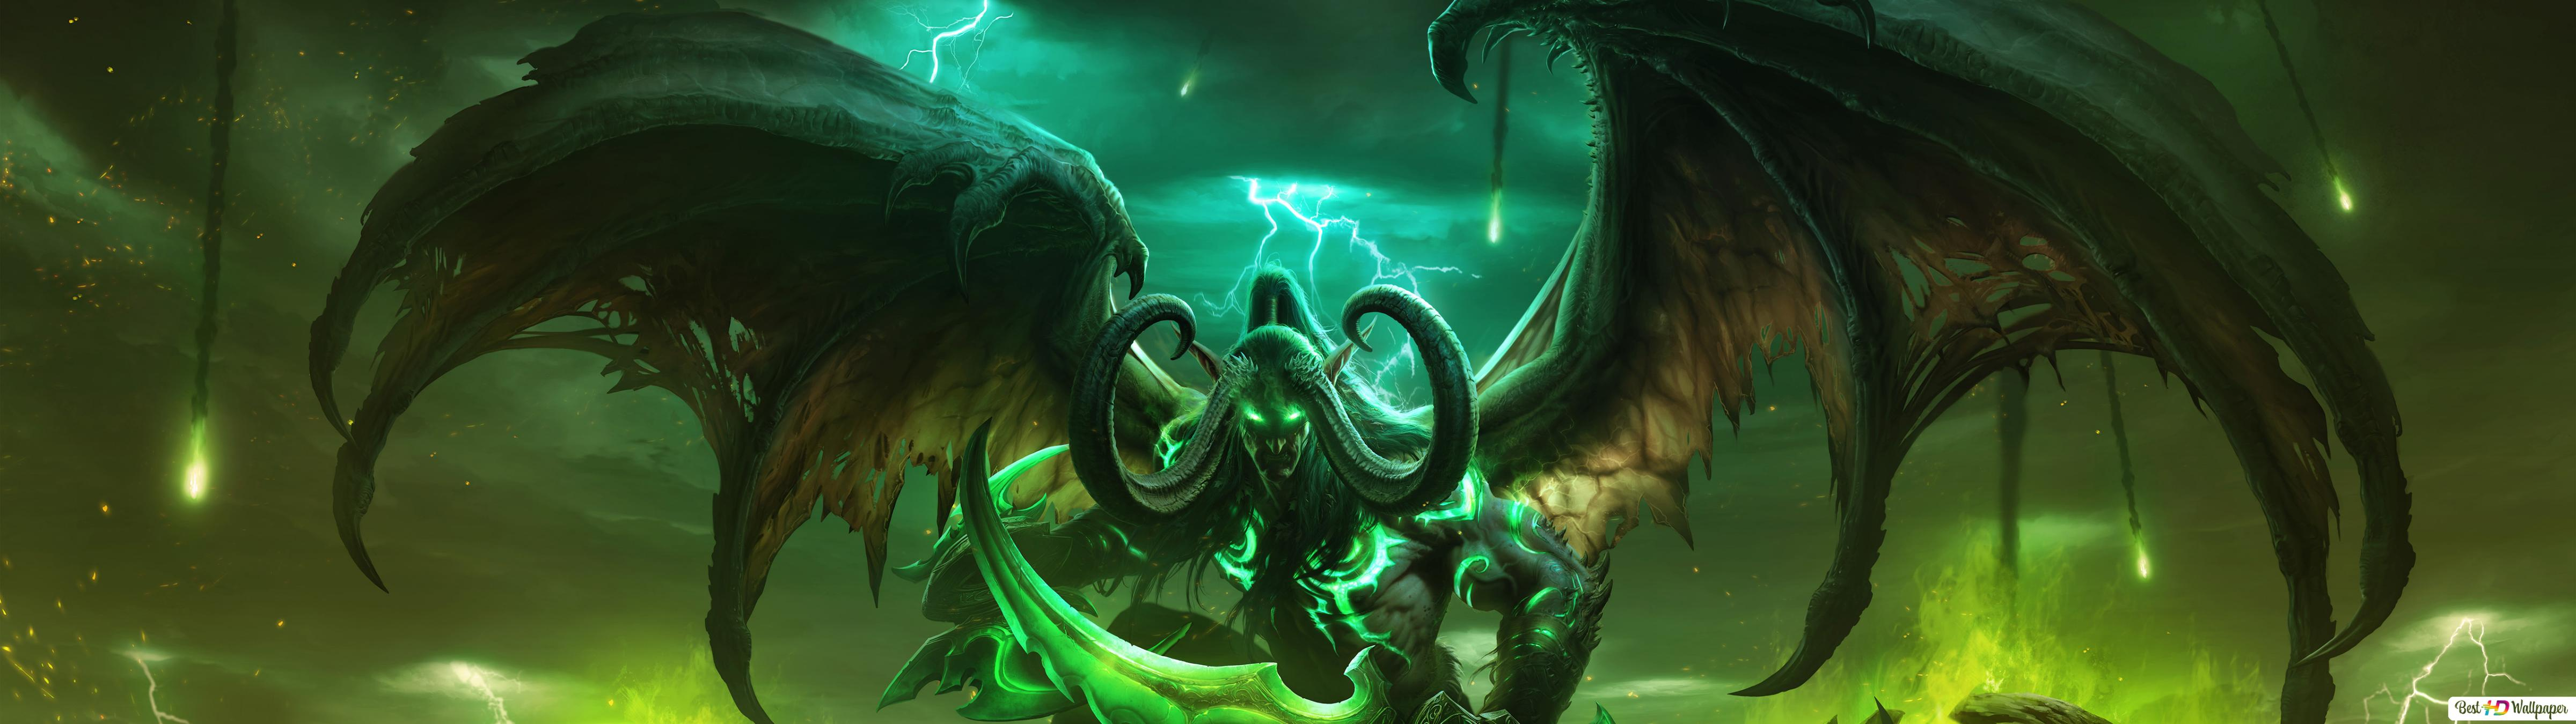 World Of Warcraft Legion Hd Wallpaper Download